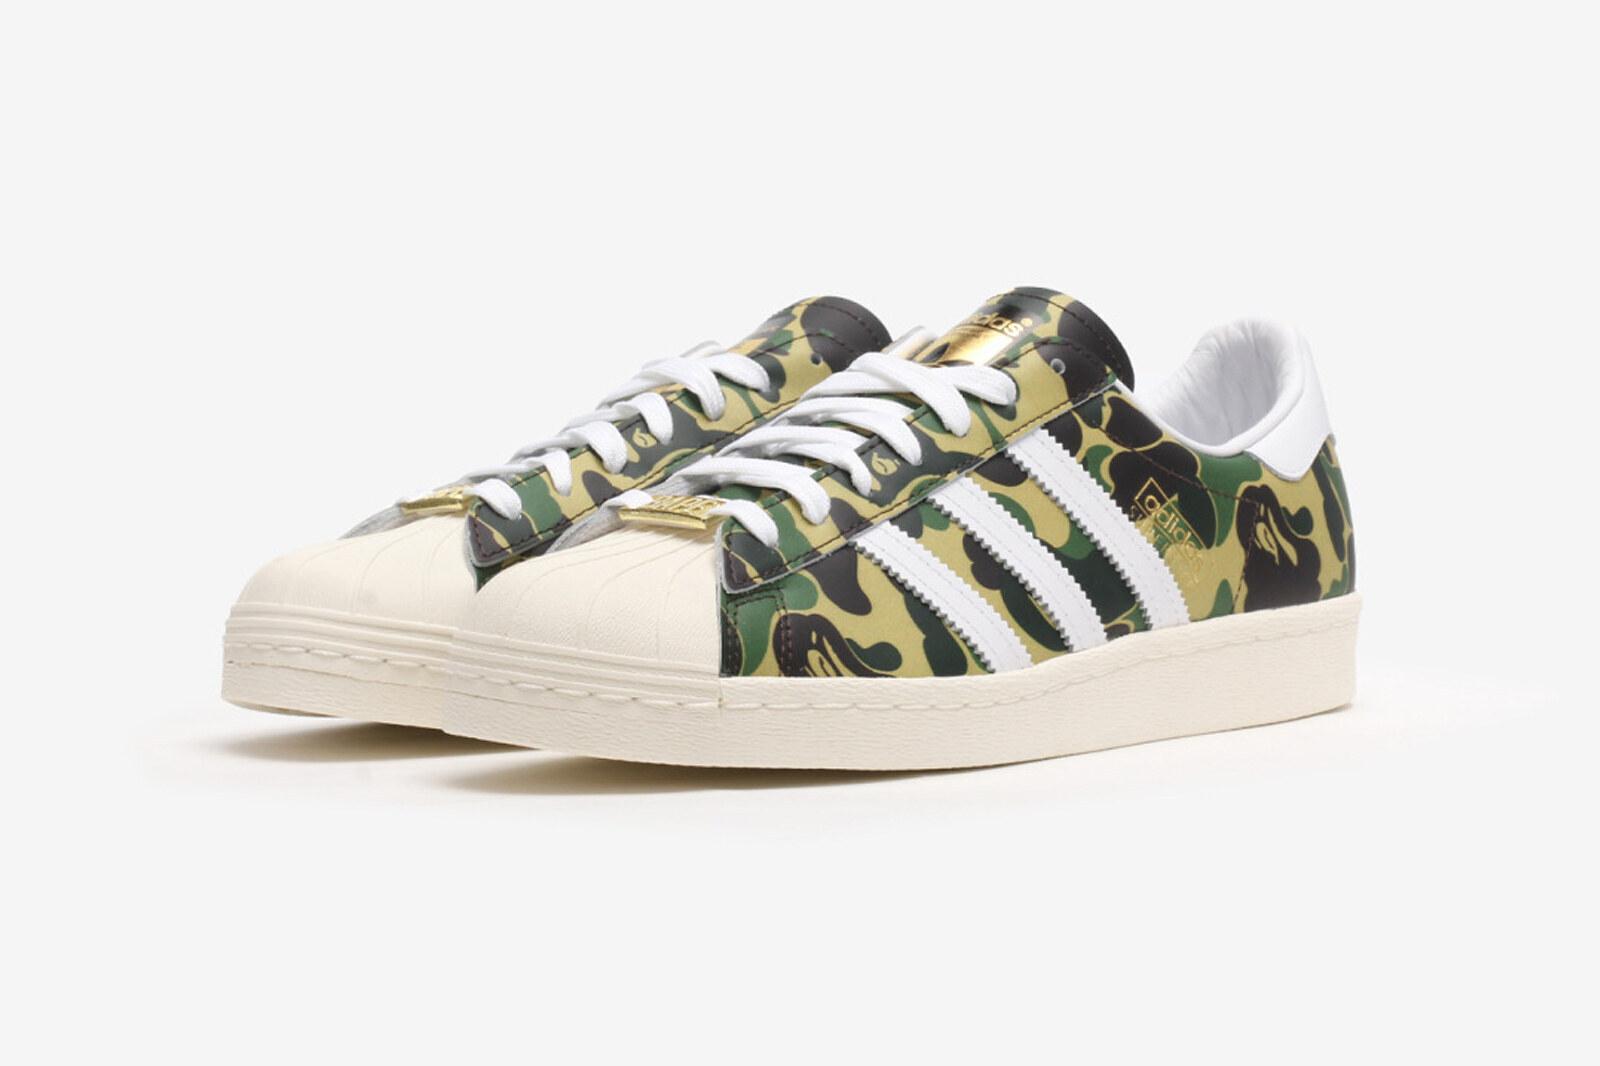 BAPE x adidas Superstar Green Camo